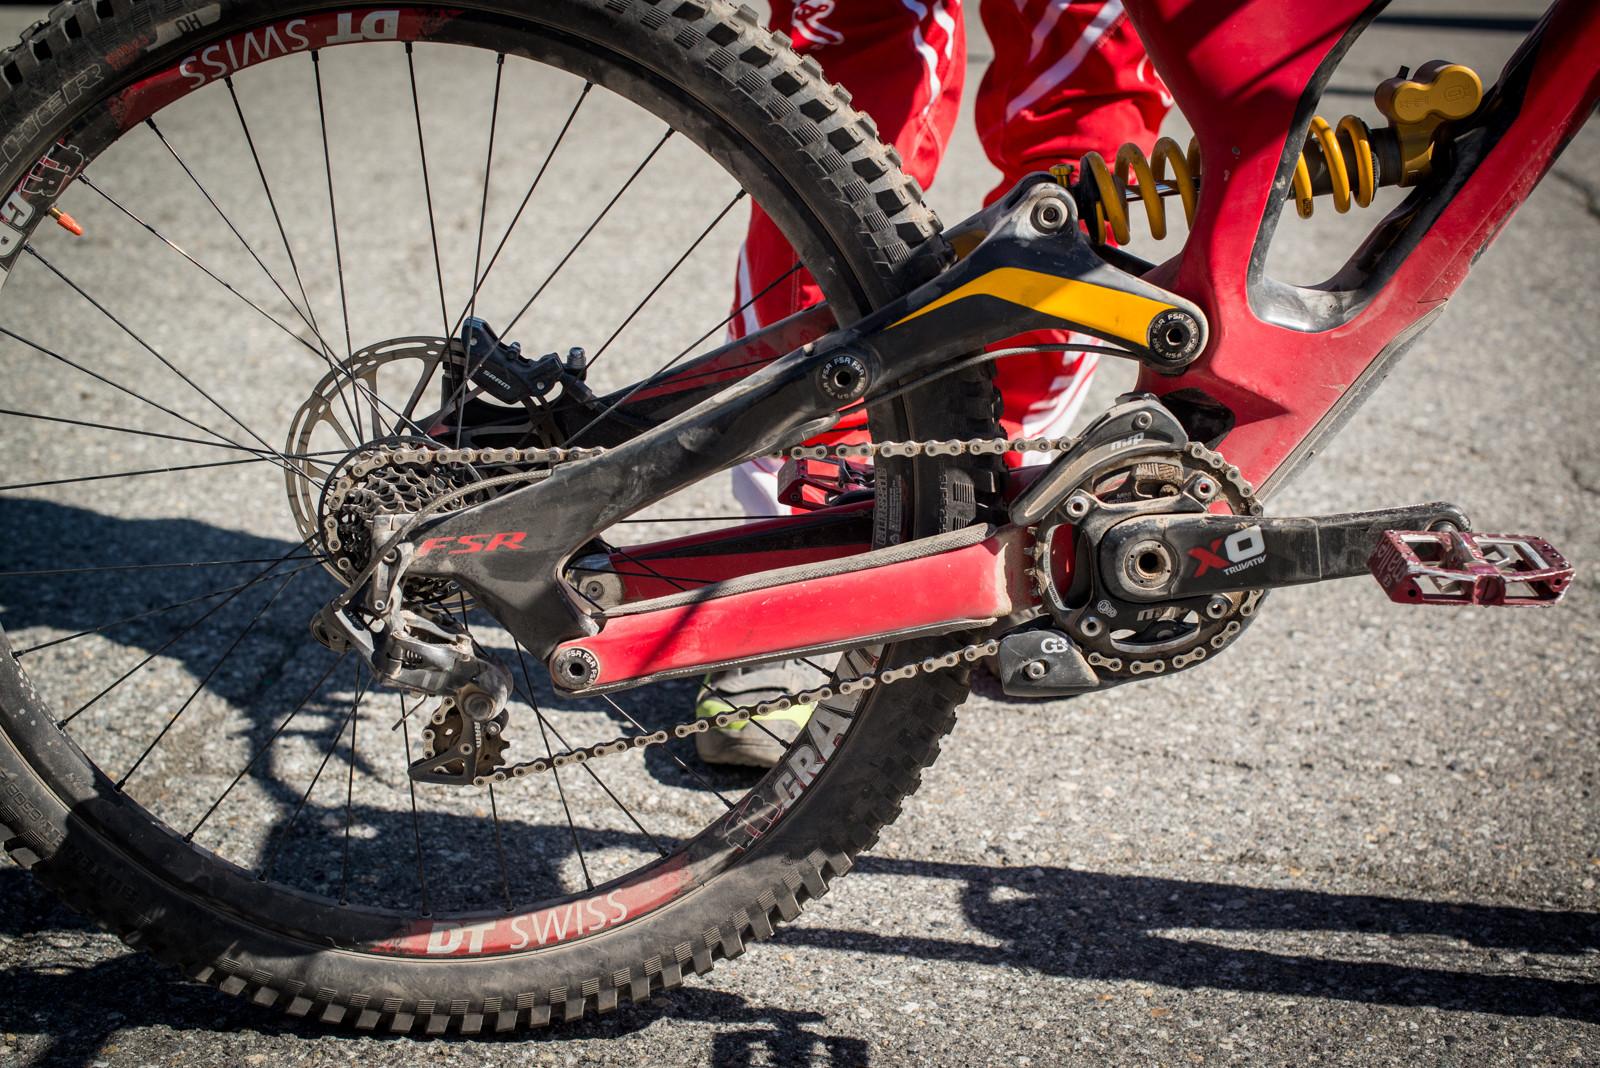 A Fine Looking Rear End - Winning Bike - Mitch Ropelato's Specialized Demo 8 - Mountain Biking Pictures - Vital MTB